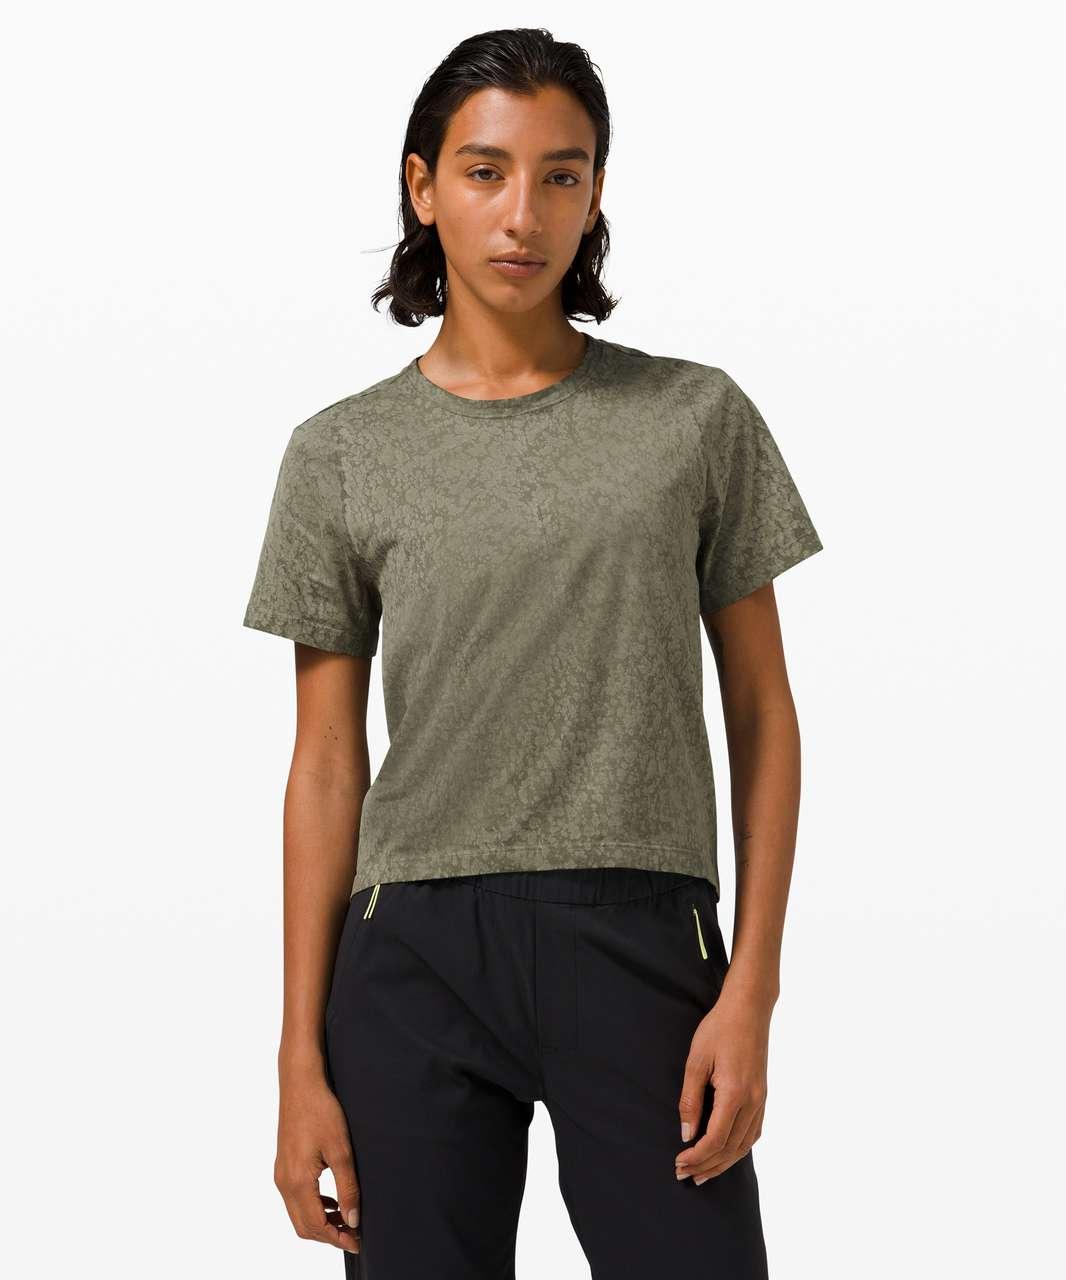 Lululemon Skreppa Short Sleeve *lululemon lab - Army Green Bloom Dye